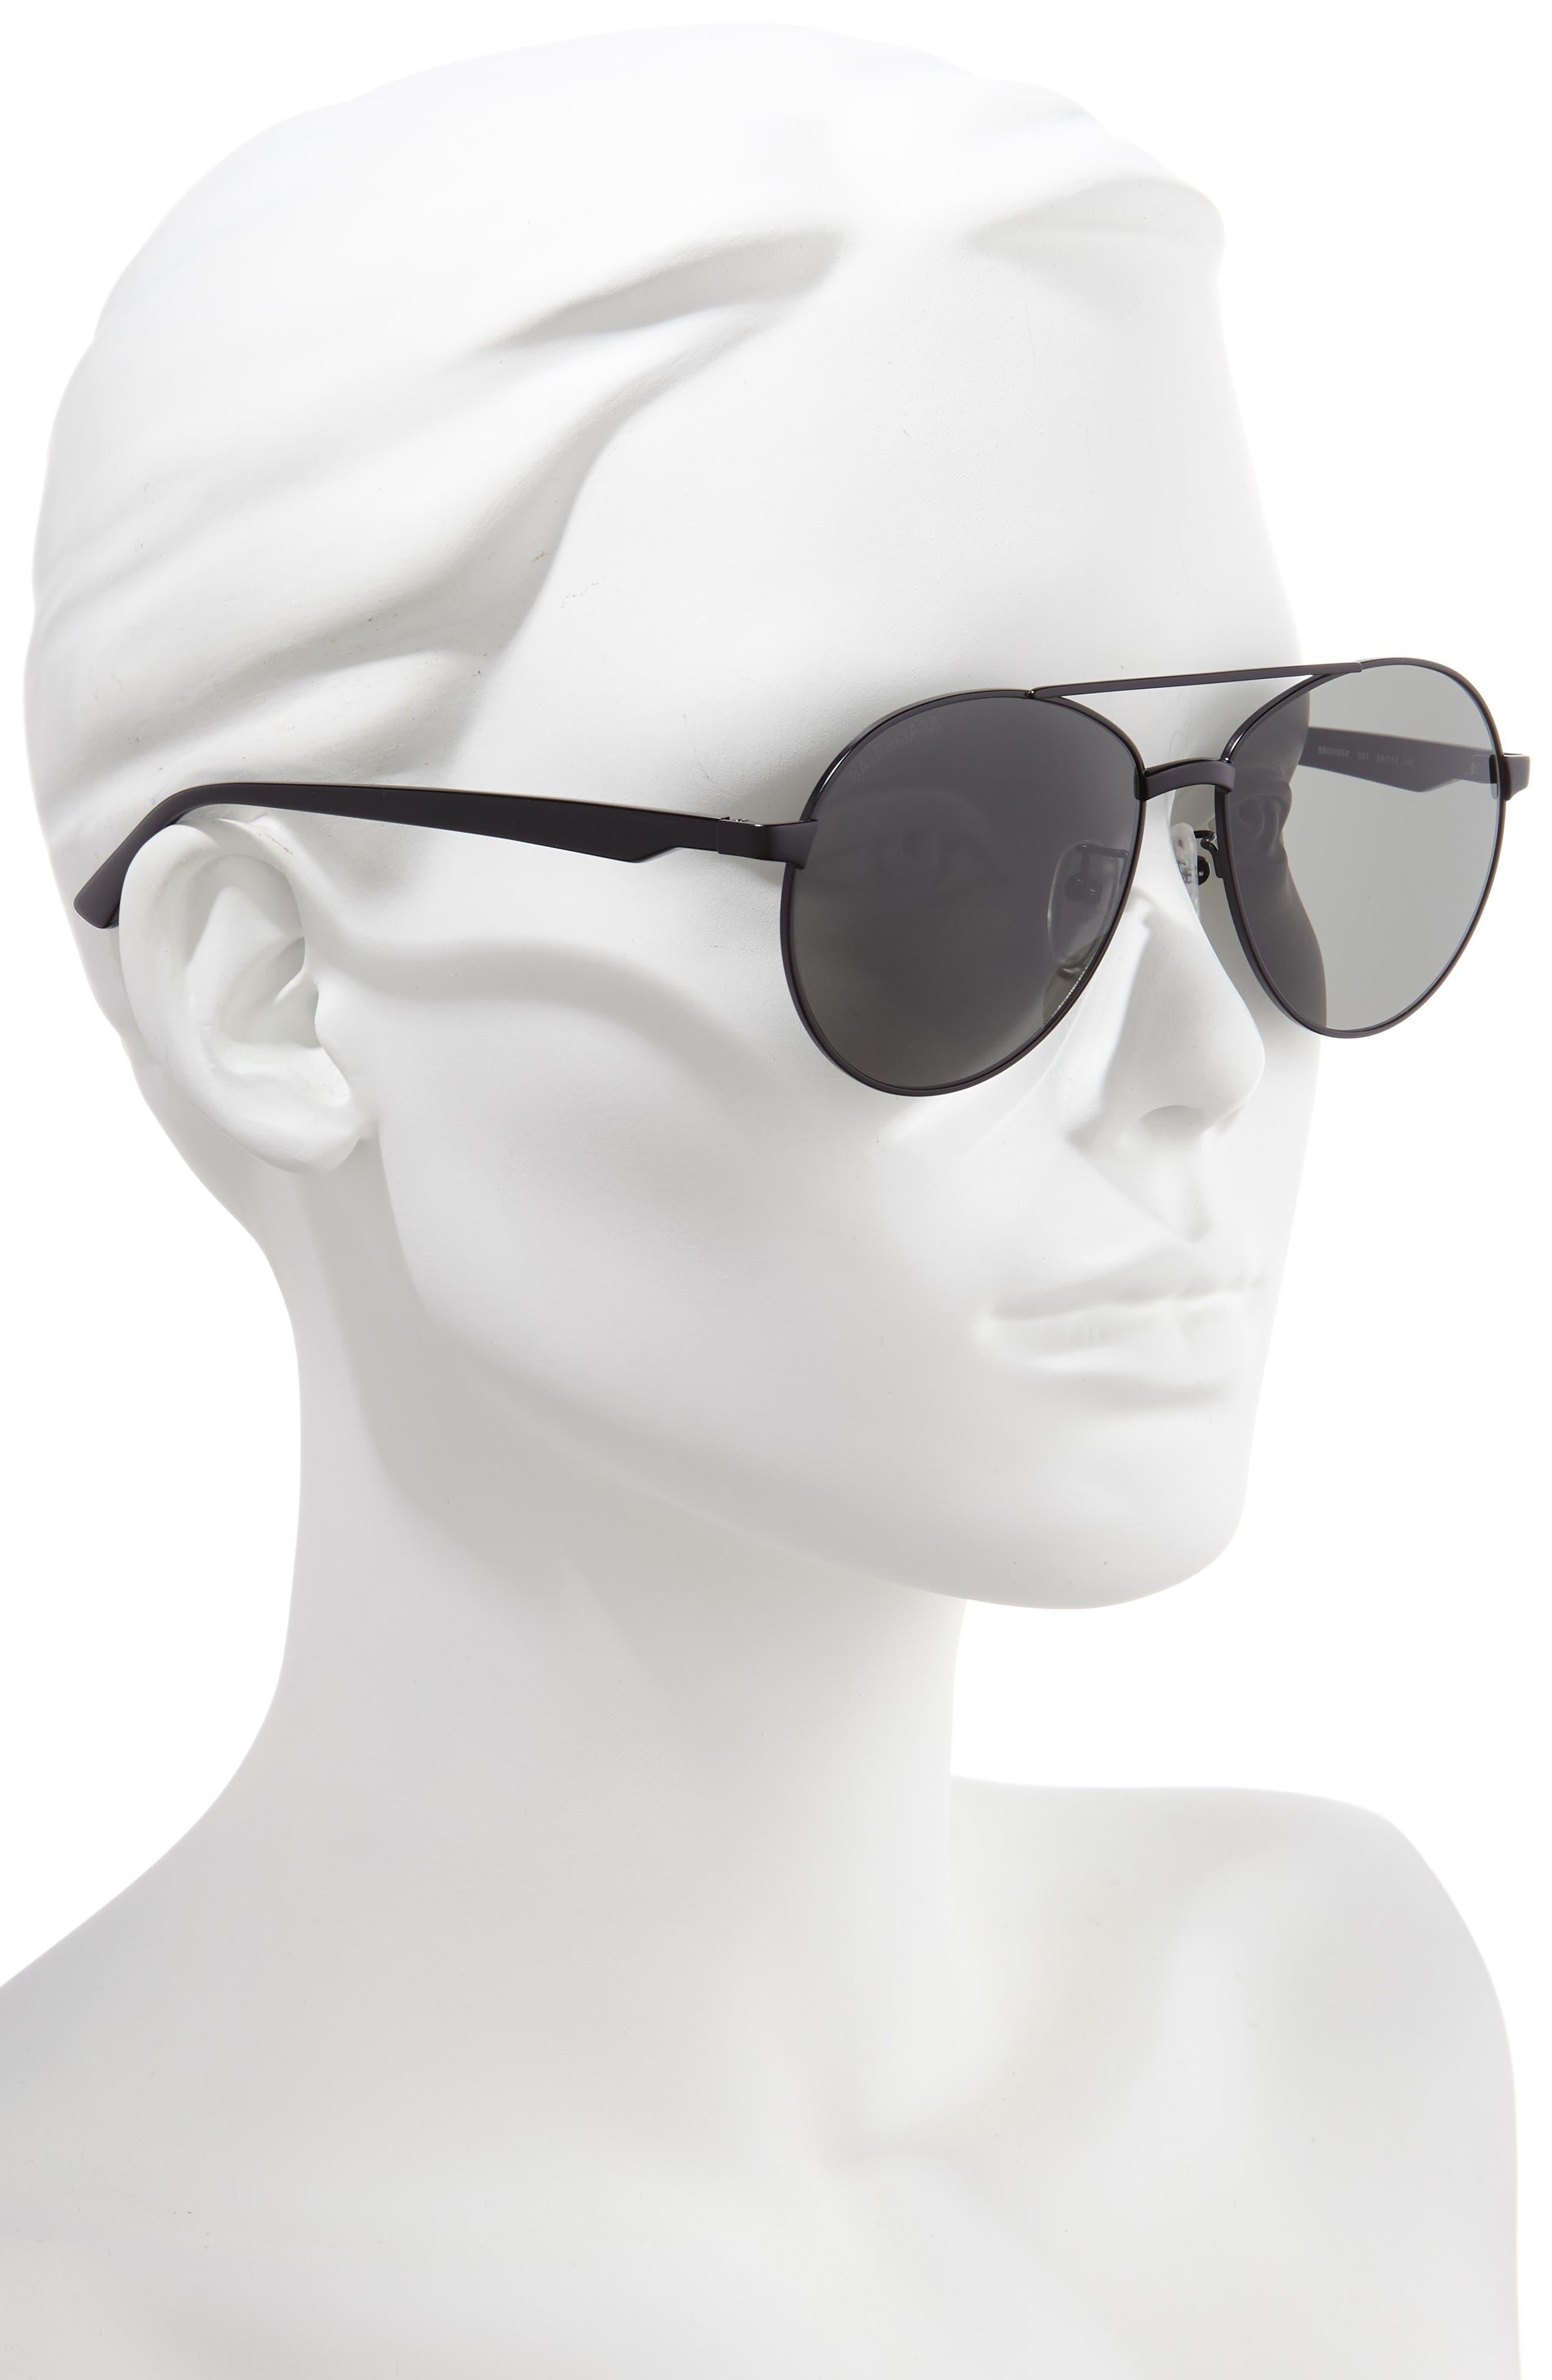 BALENCIAGA, 59mm Aviator Sunglasses, Alternate thumbnail 2, color, SEMI-MATTE BLACK/ GREY